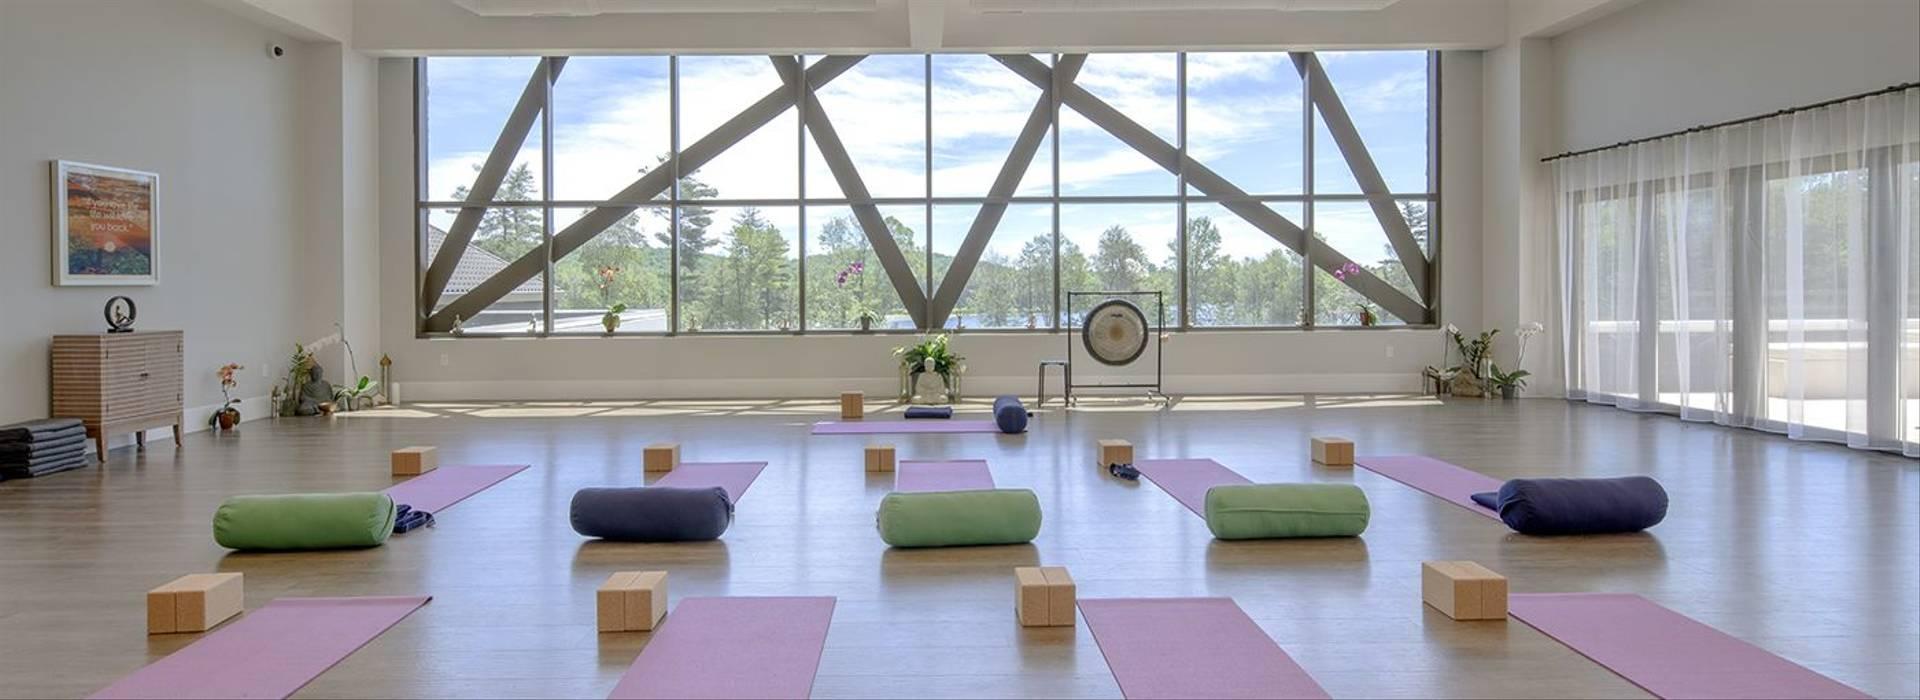 YO1-Health-Resort-Yoga-Room.jpg